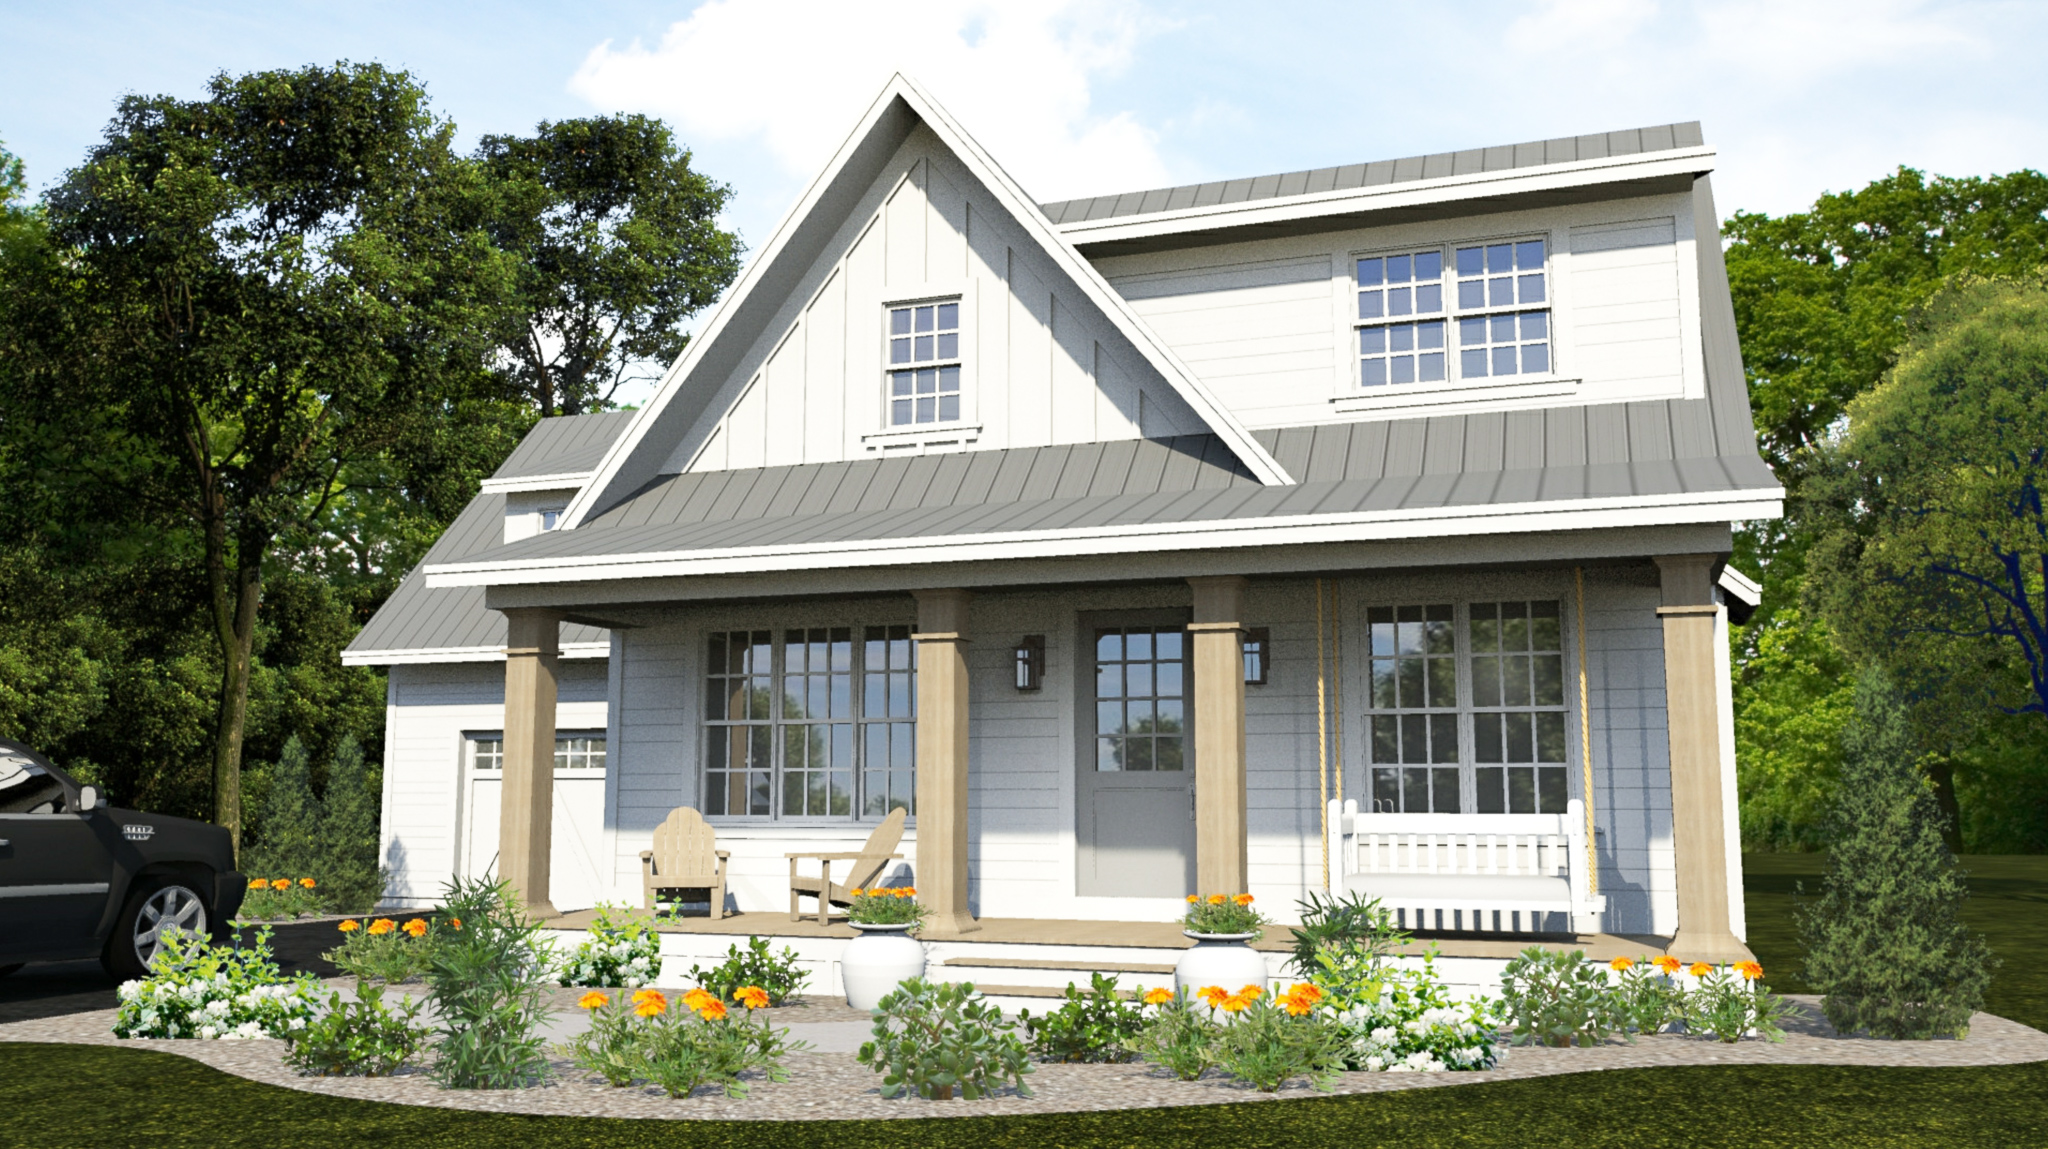 The Birch House Concept copy.jpg